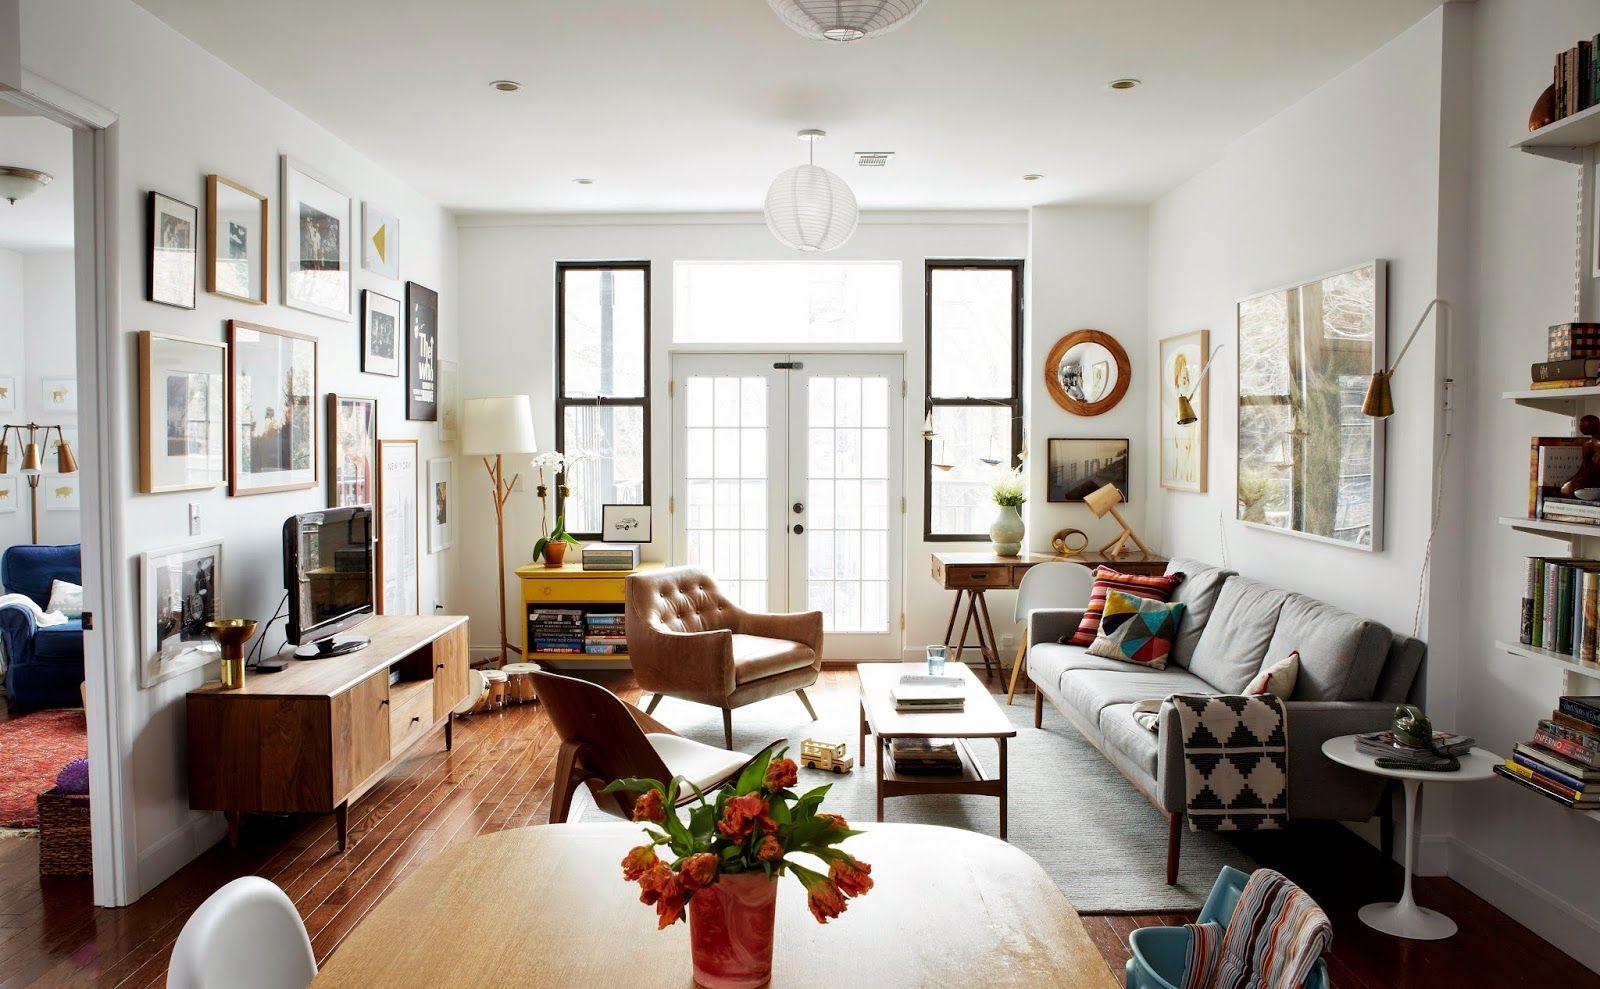 joanna-goddard-house-tour-brooklyn-living-room.jpg 1.600×989 piksel